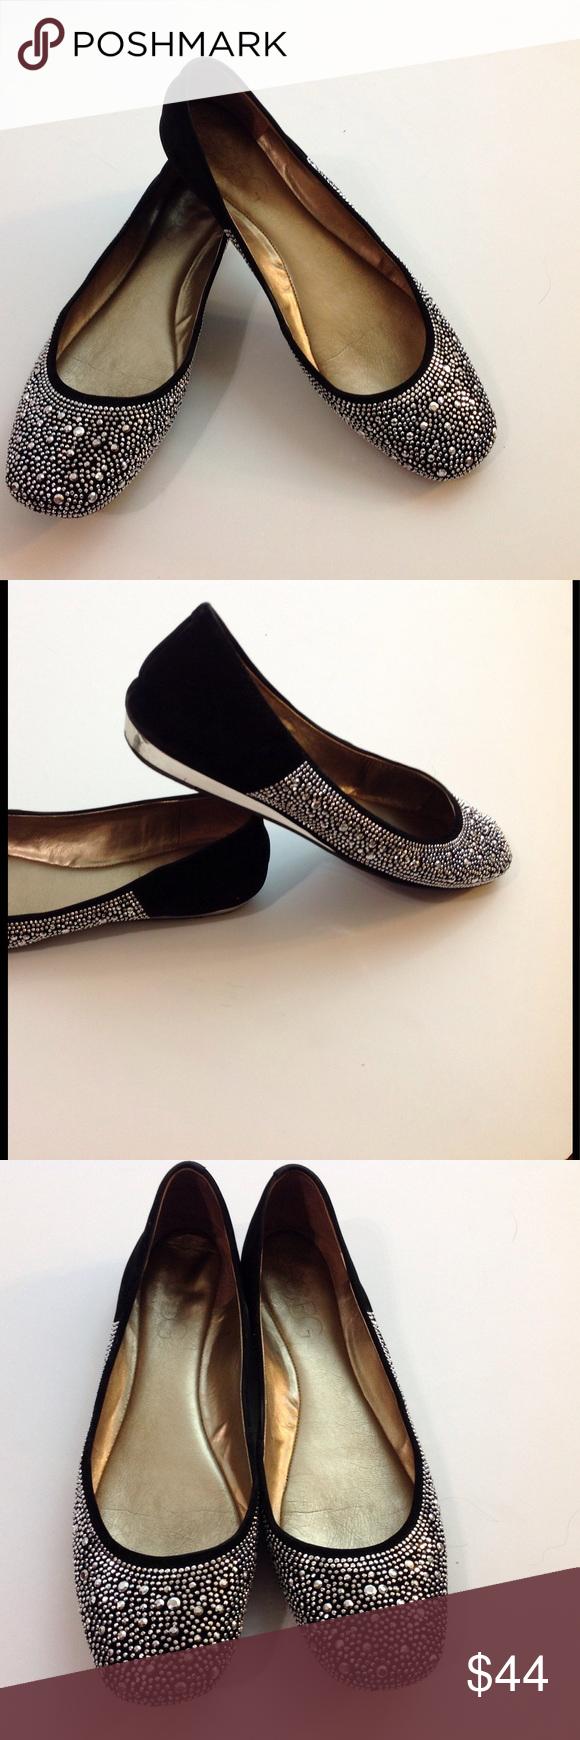 ce956f9f8c0 BCBG Paris Black w Silver Stones Flats MUST HAVE! BCBG Paris Black w Silver  Studded Ballet Flats. Round toe